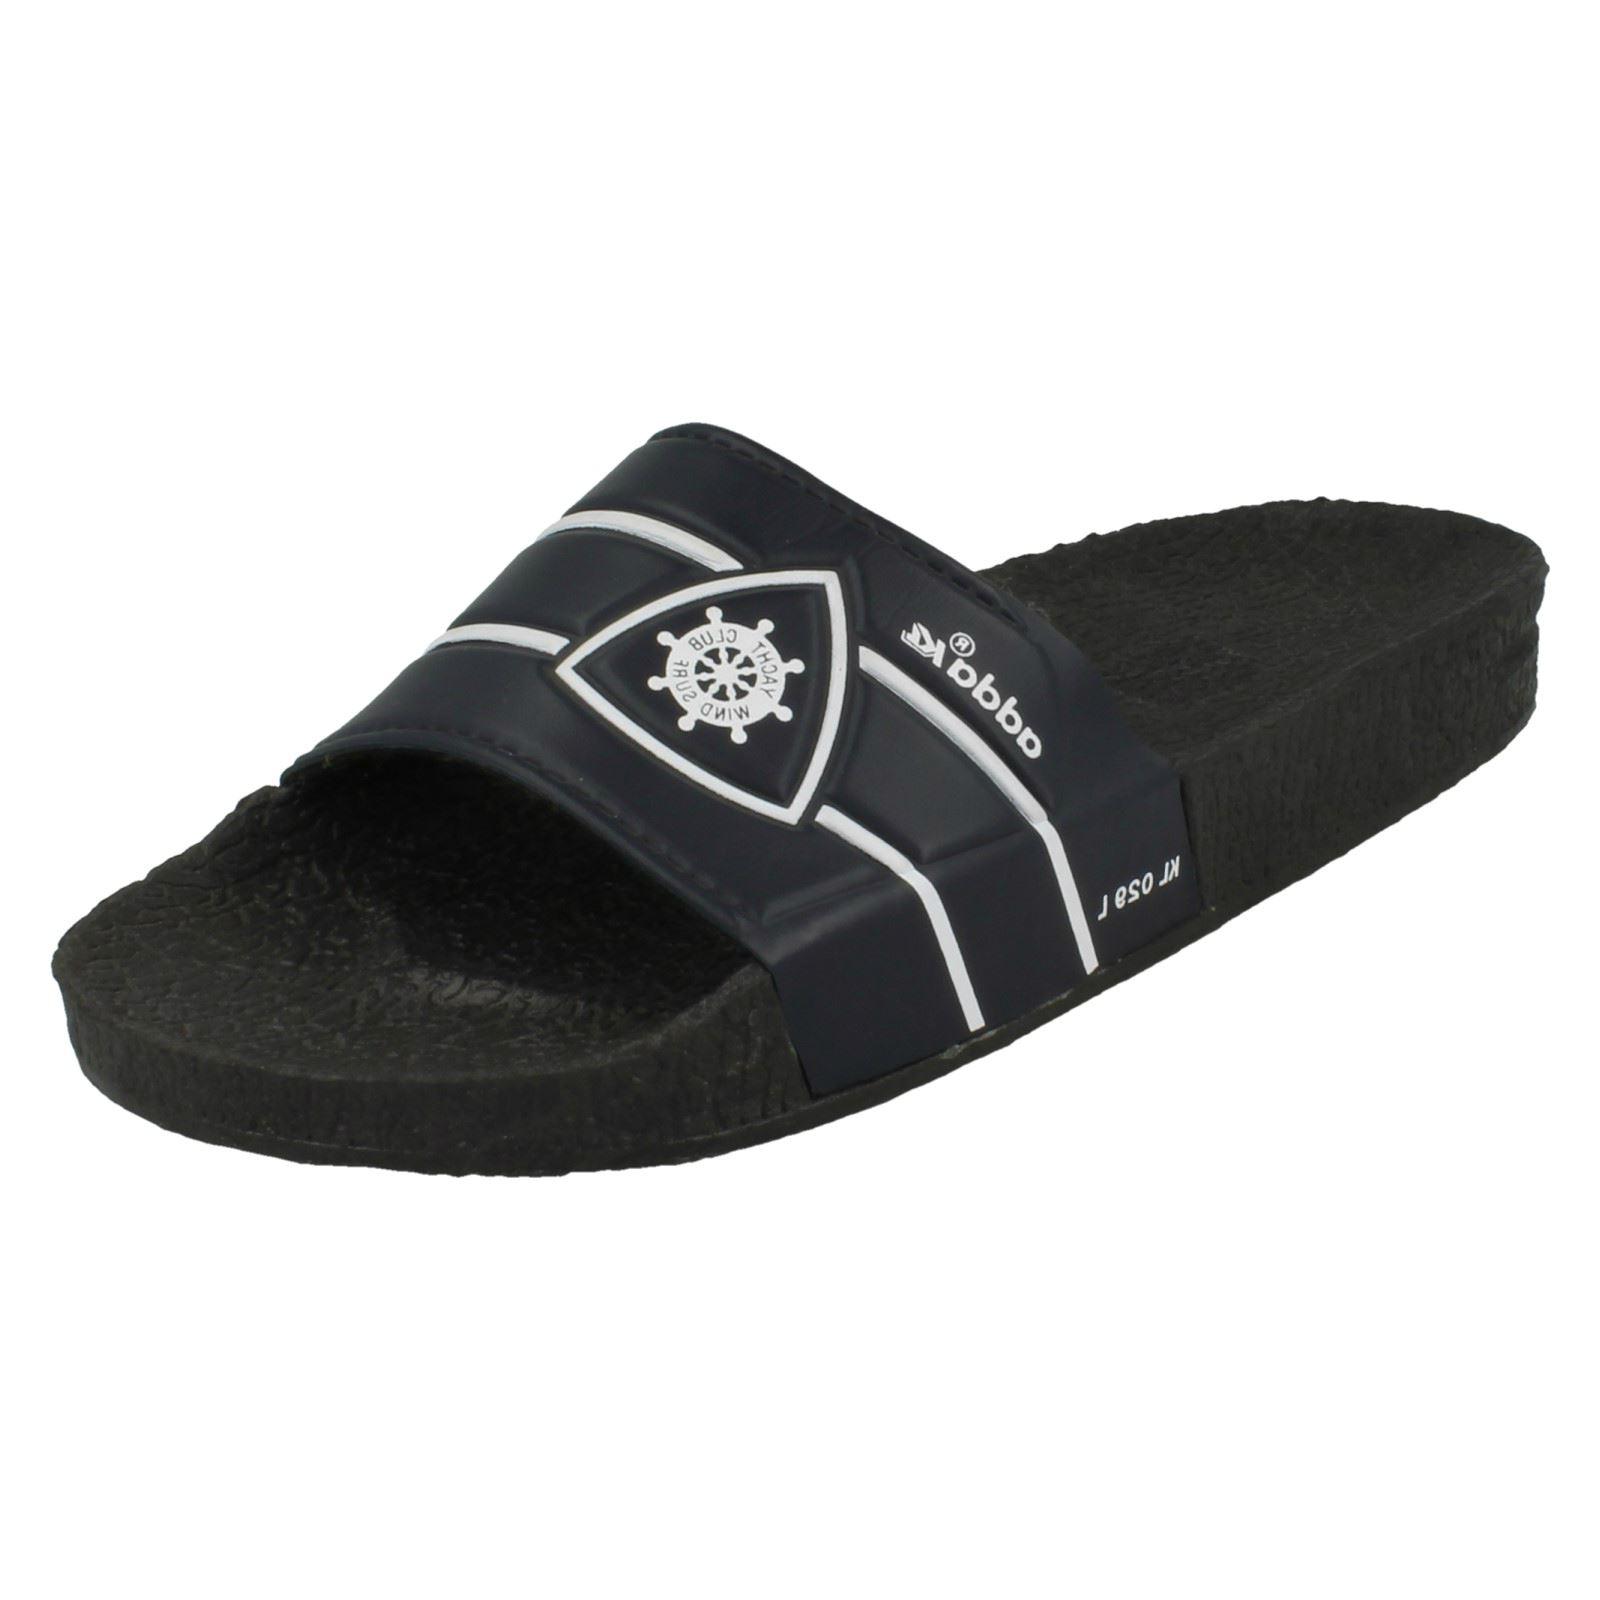 Mens Adda Casual Slip On Flat Mule KL029